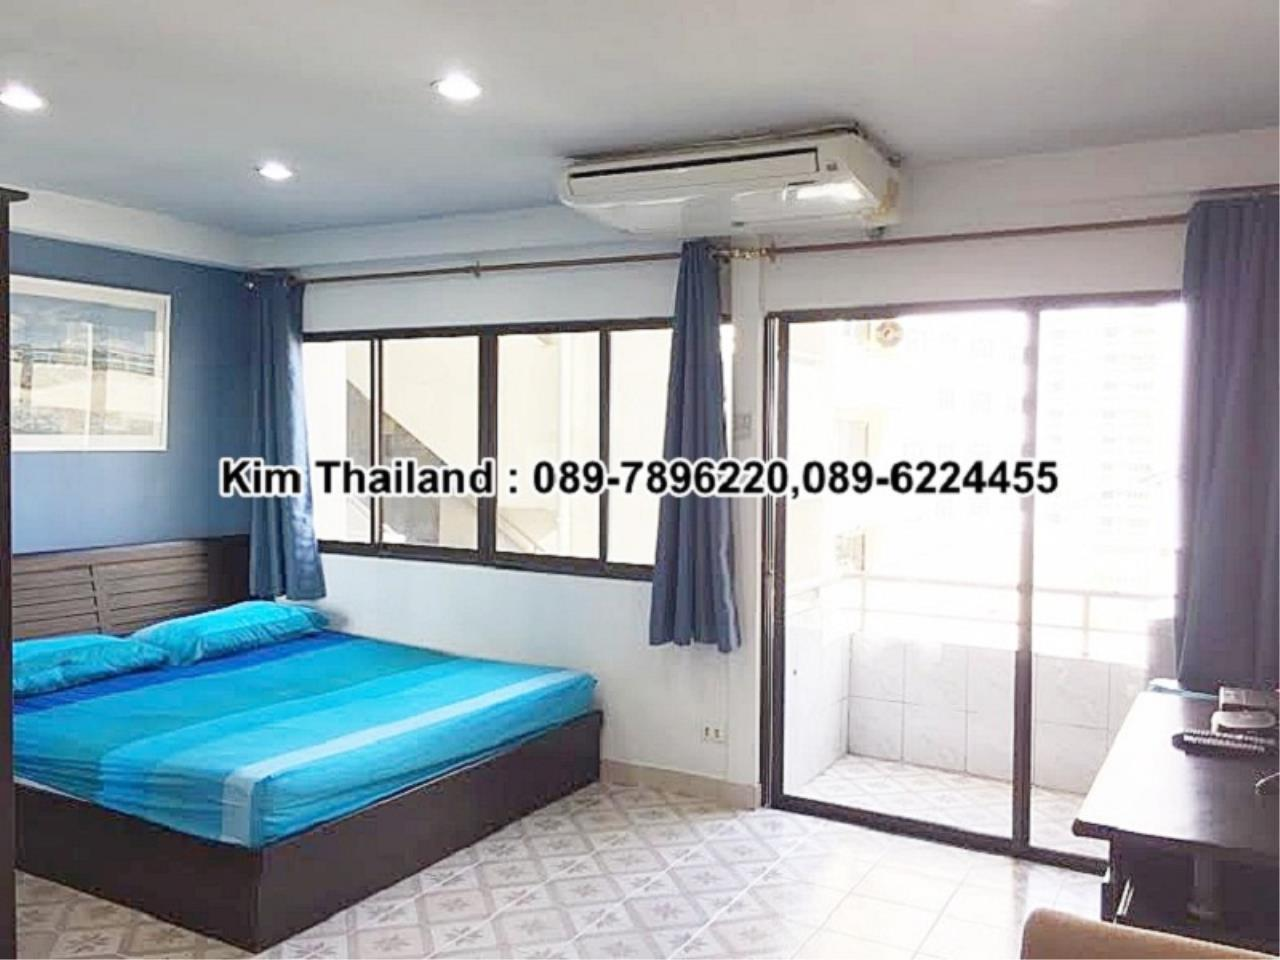 BKKcondorental Agency's For rent, Condo Saranjai Mansion. Area 35 sq.m. Studio. Rent 16,000baht/month 2